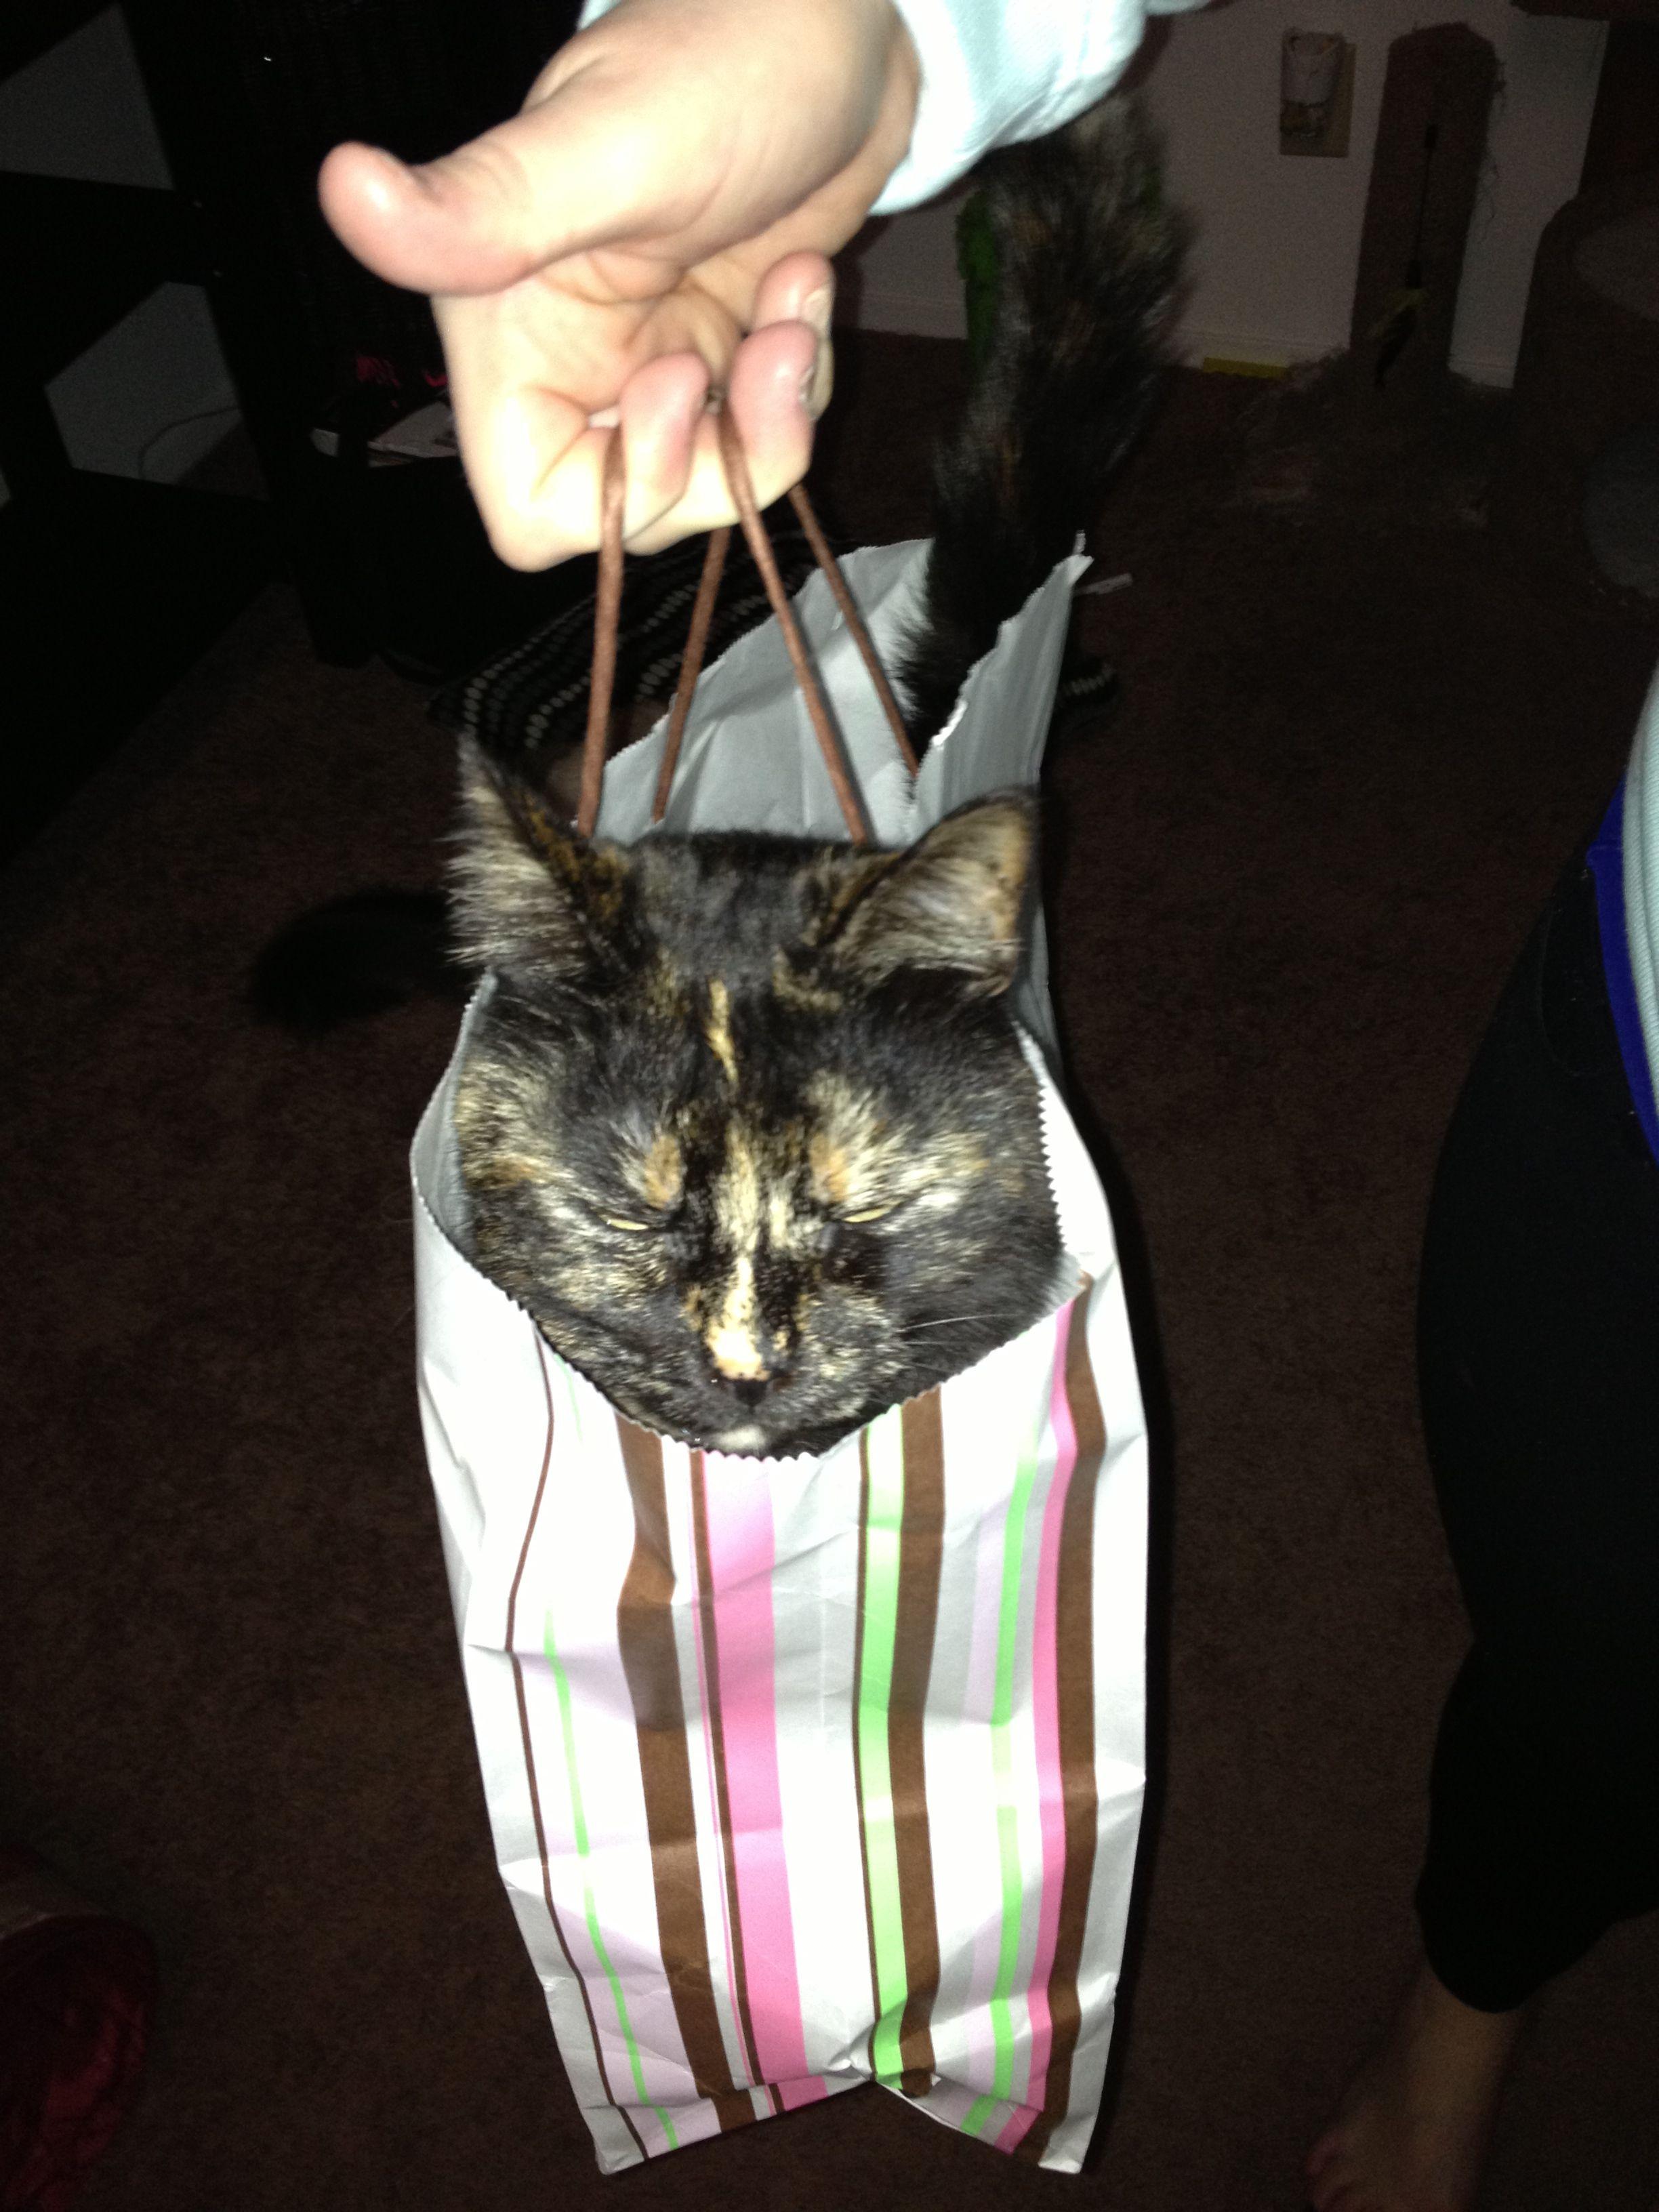 So cute! Torti in a bag. My Kiwi